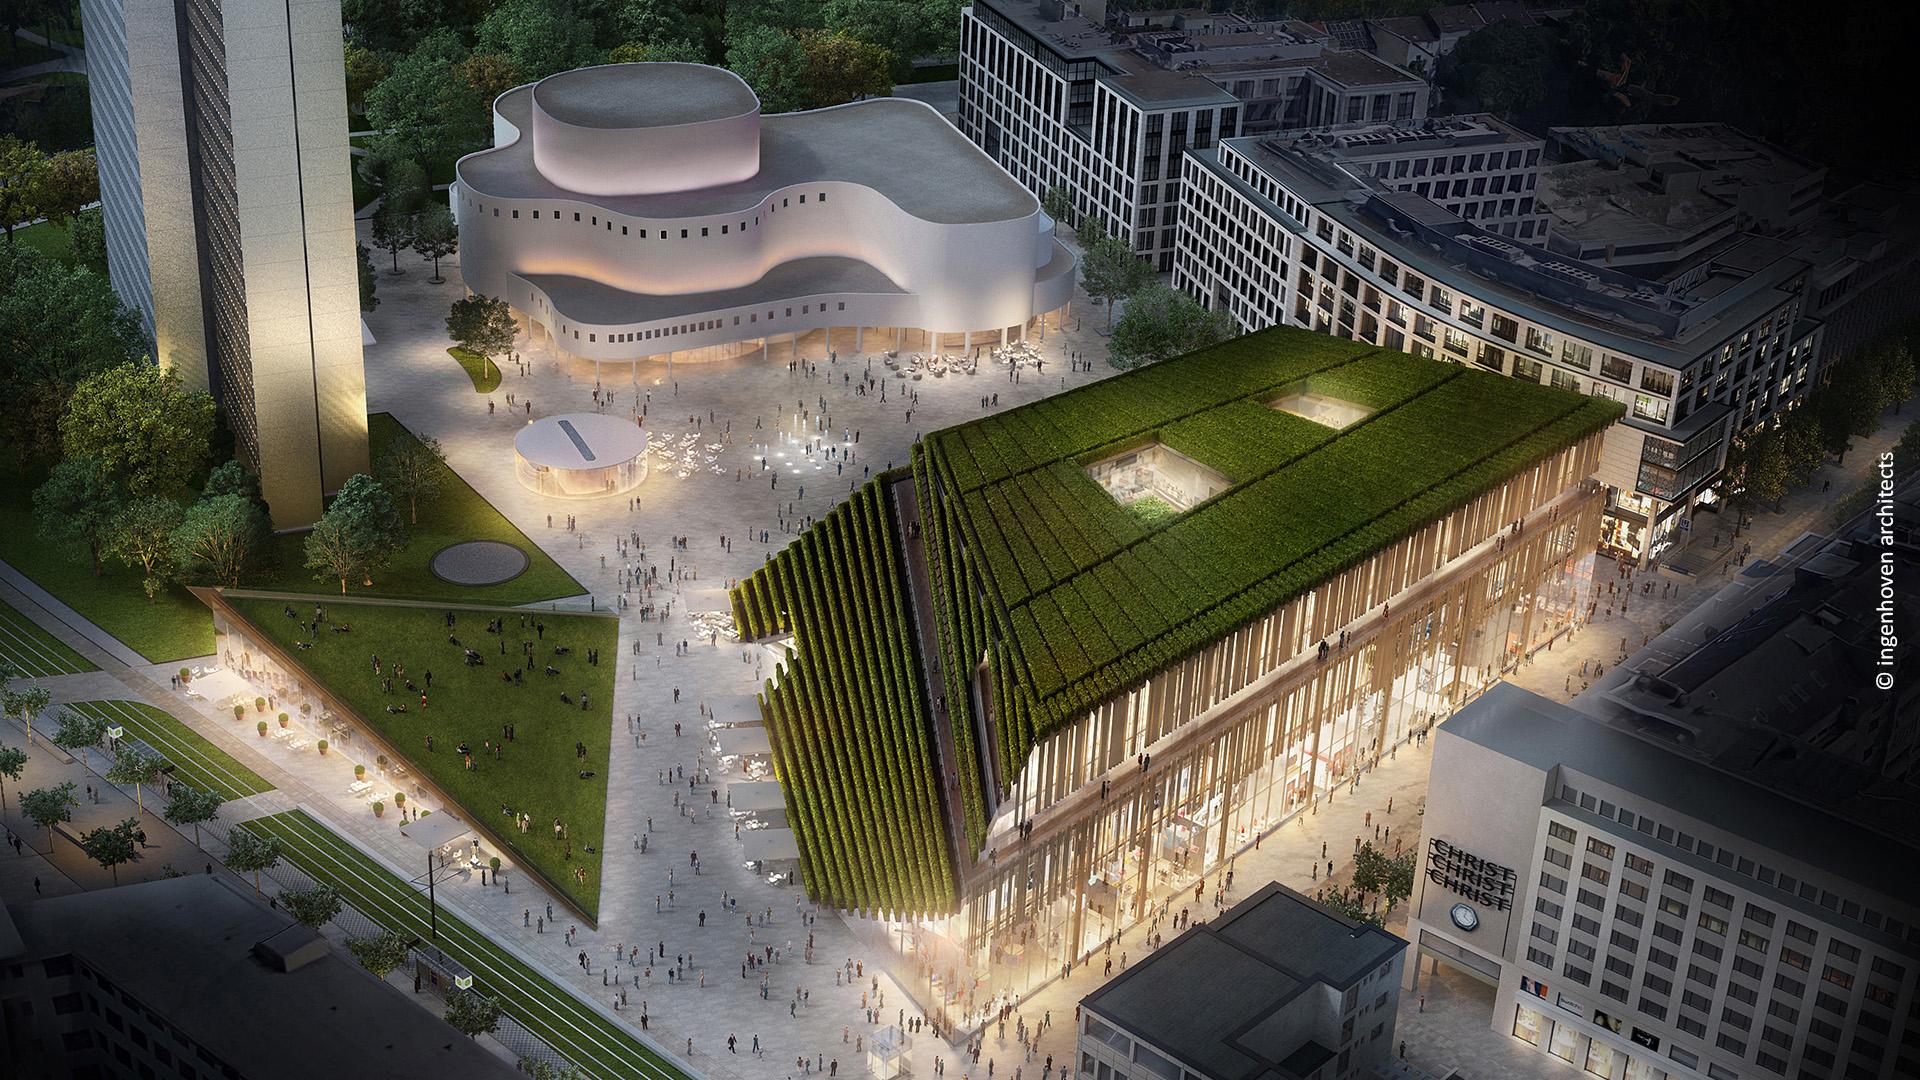 Kö-Bogen II in Düsseldorf © Ingenhoven architects